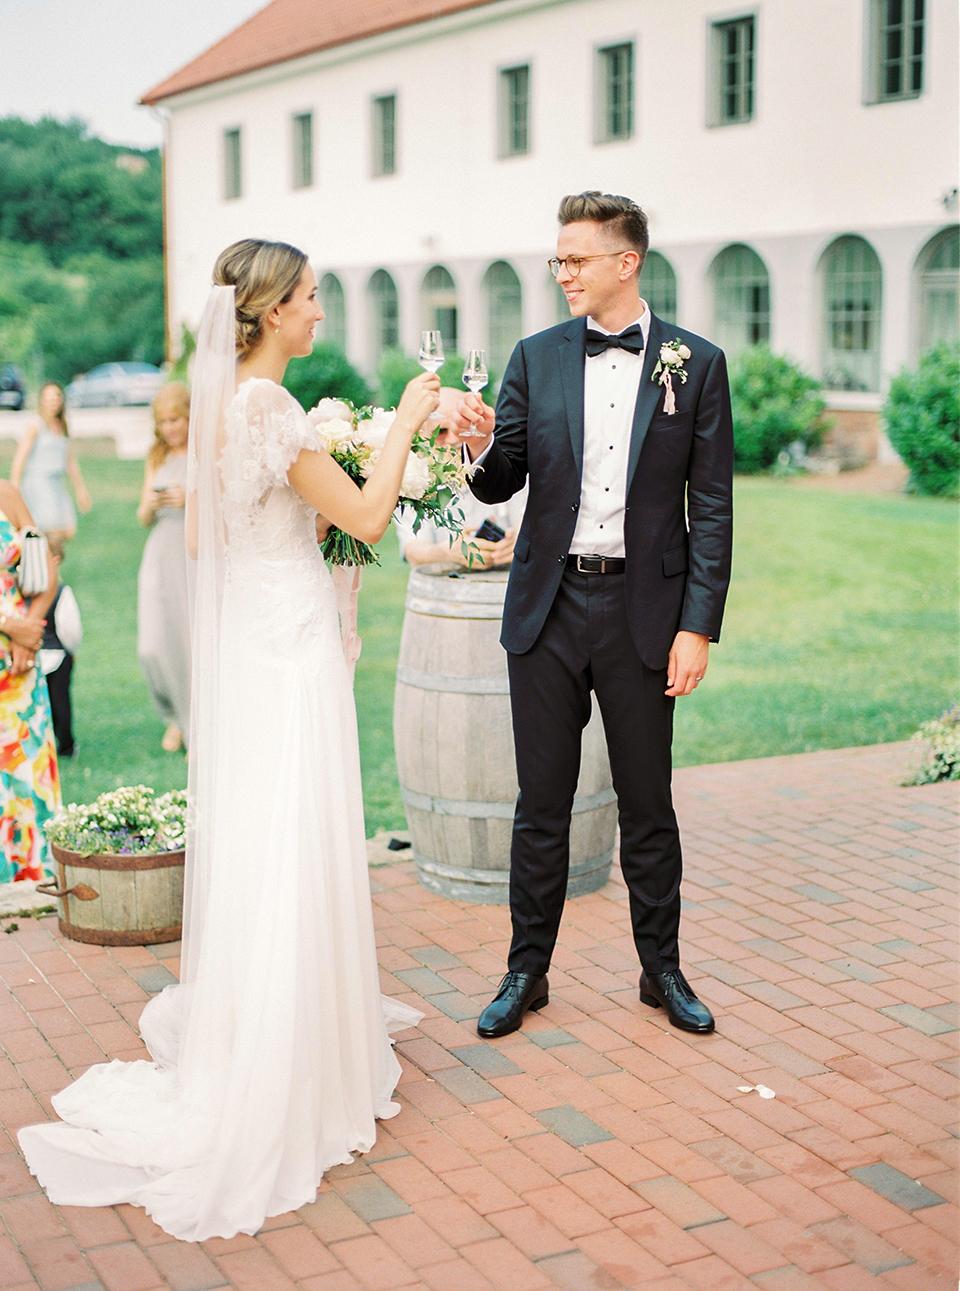 wedding-podcast-destination-wedding-planning (3).jpg